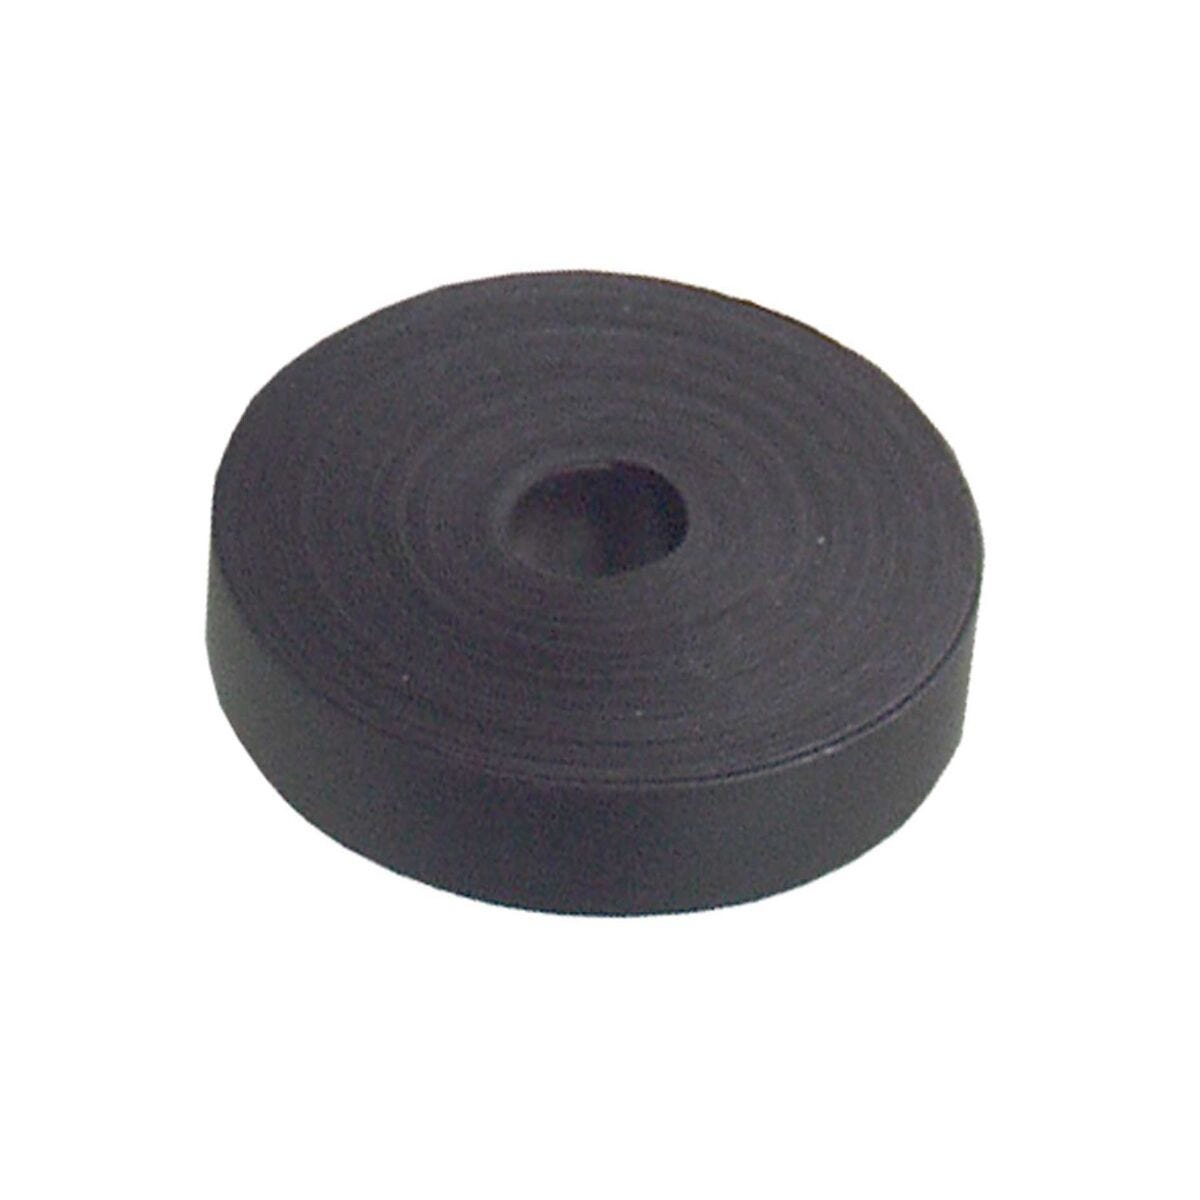 Bisilque Self Adhesive Gridding Tape 6mm x 10m